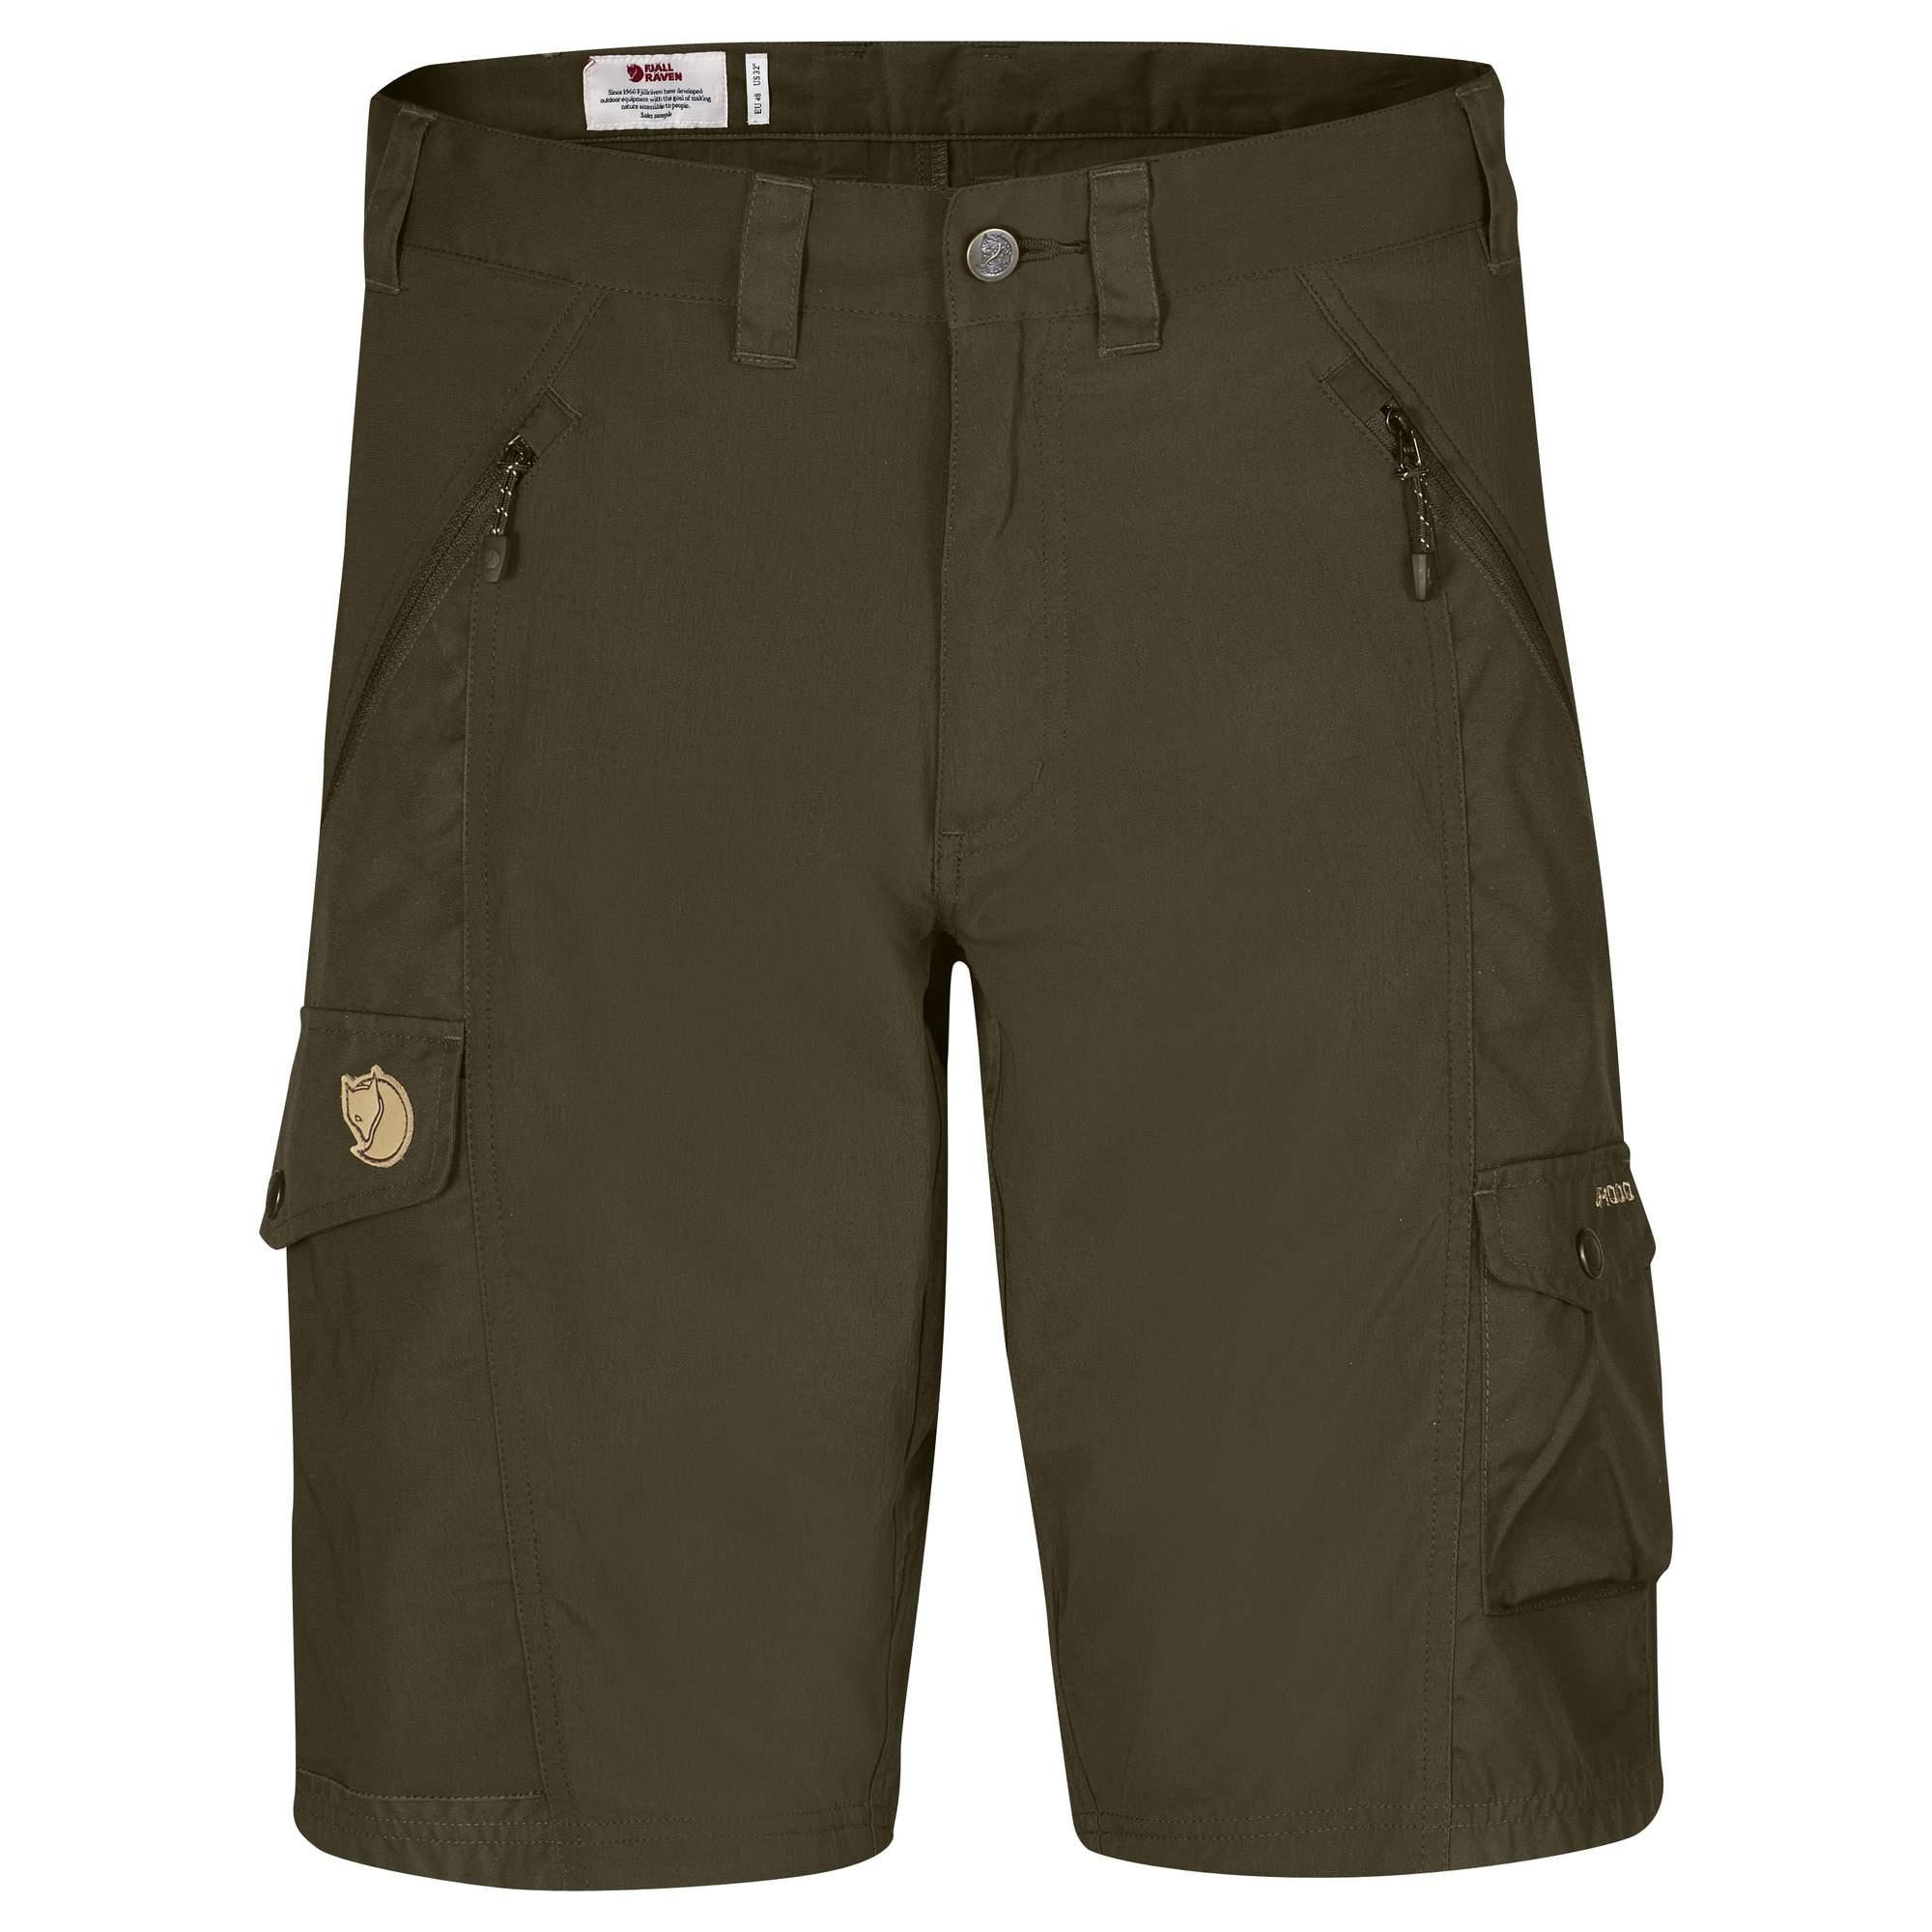 Abisko shorts Fjllrvenjpg